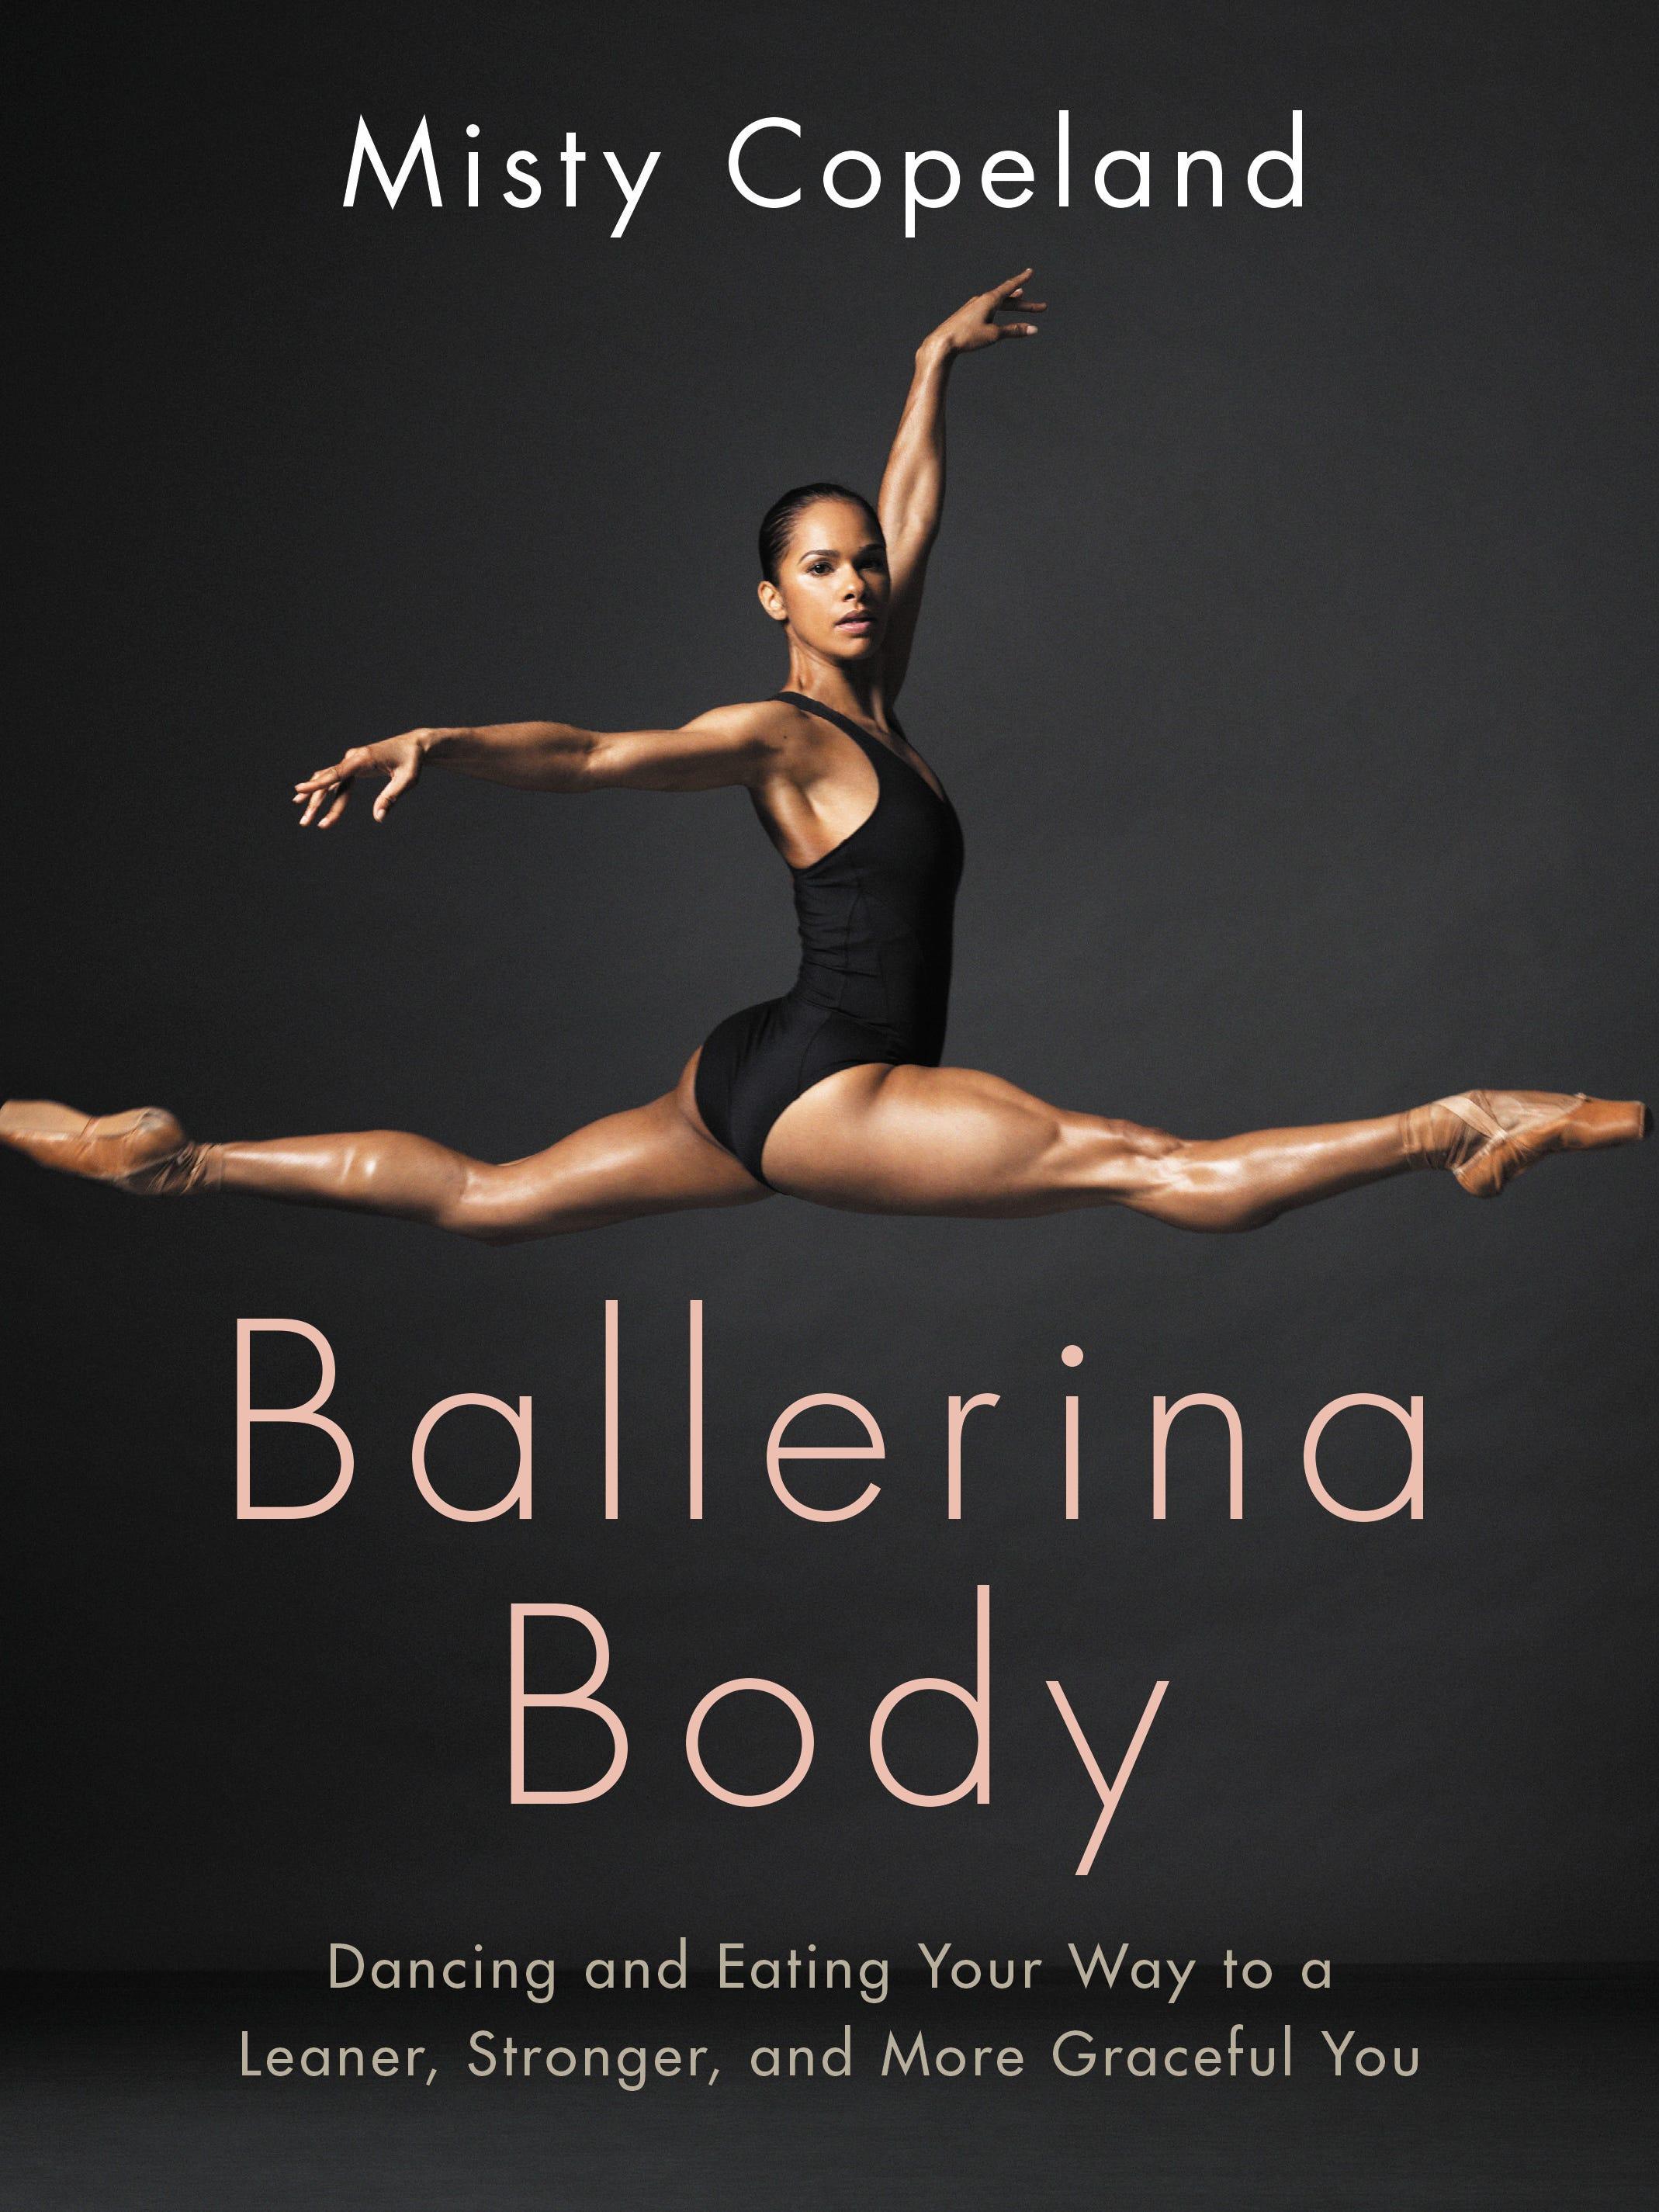 Misty Copeland's best advice for achieving a 'Ballerina Body'